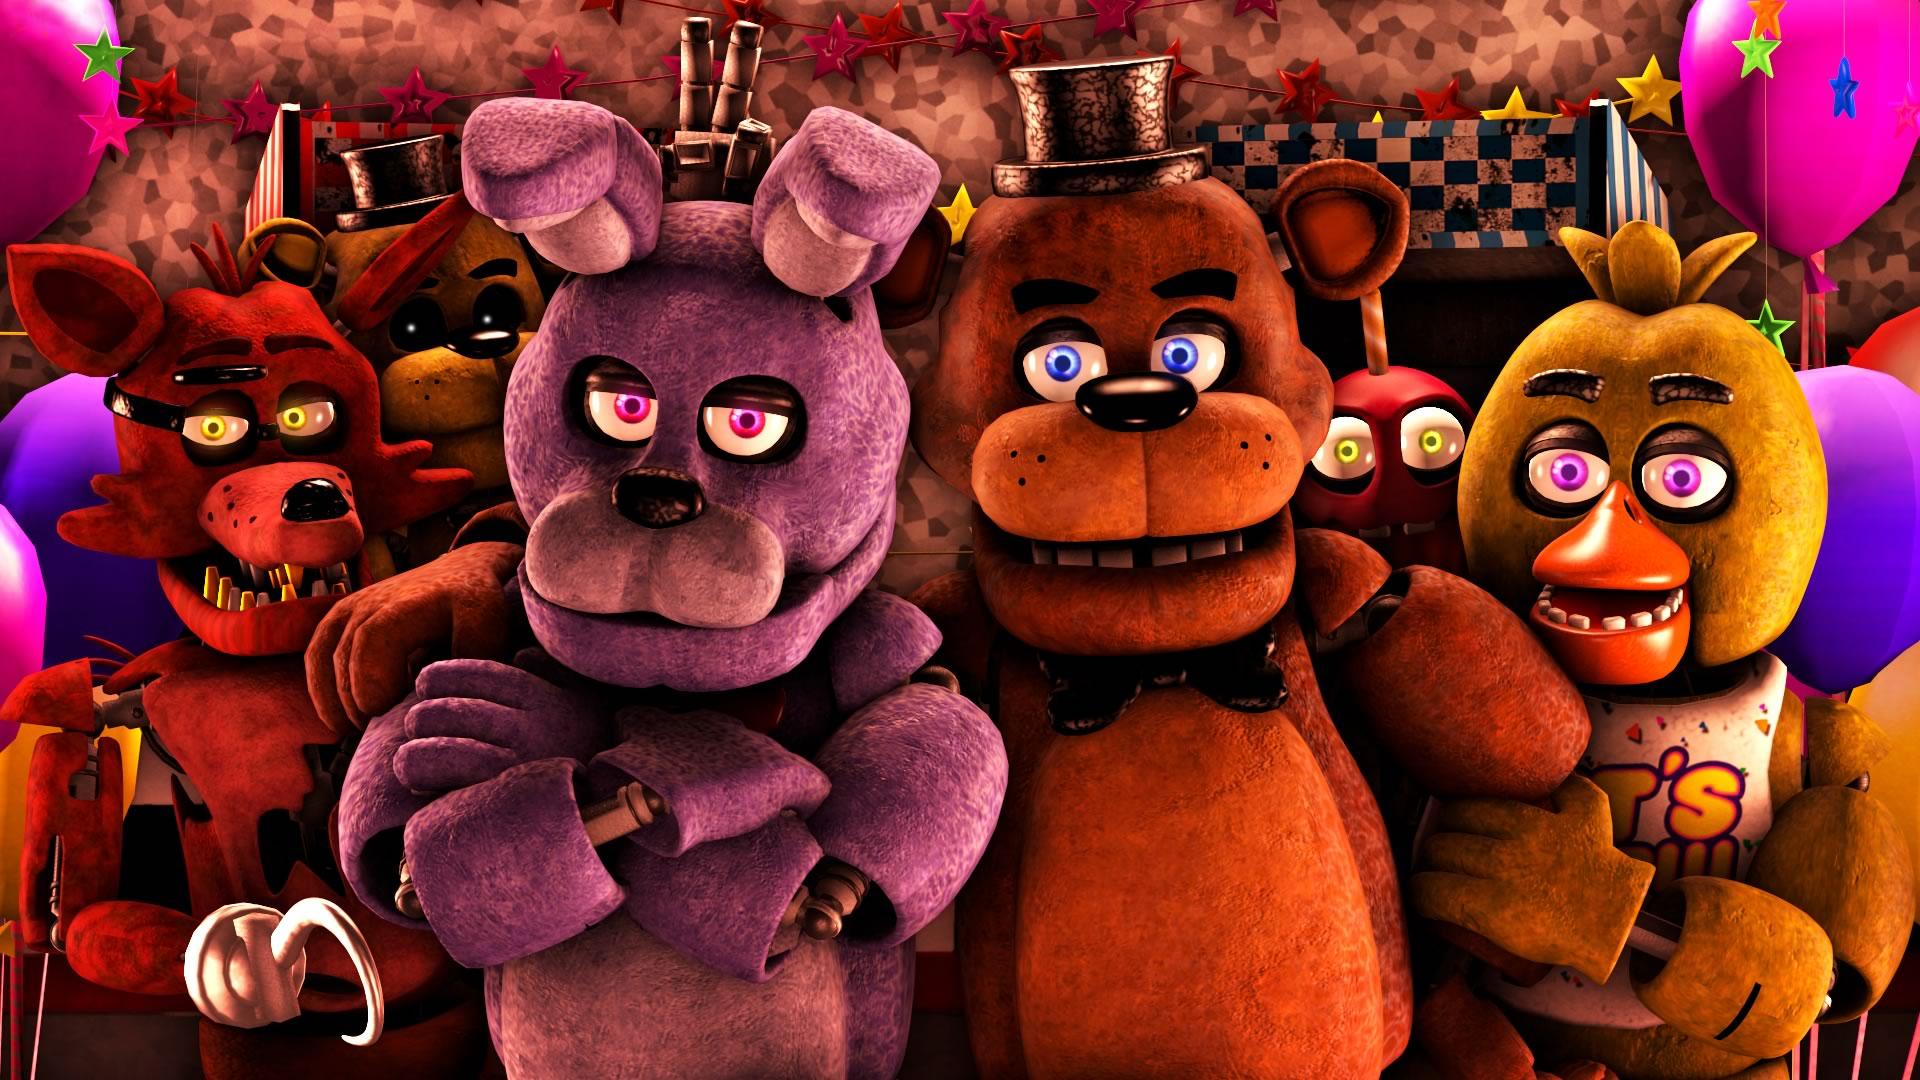 Leuk voor kids - wallpaper: Five Nights at Freddy's